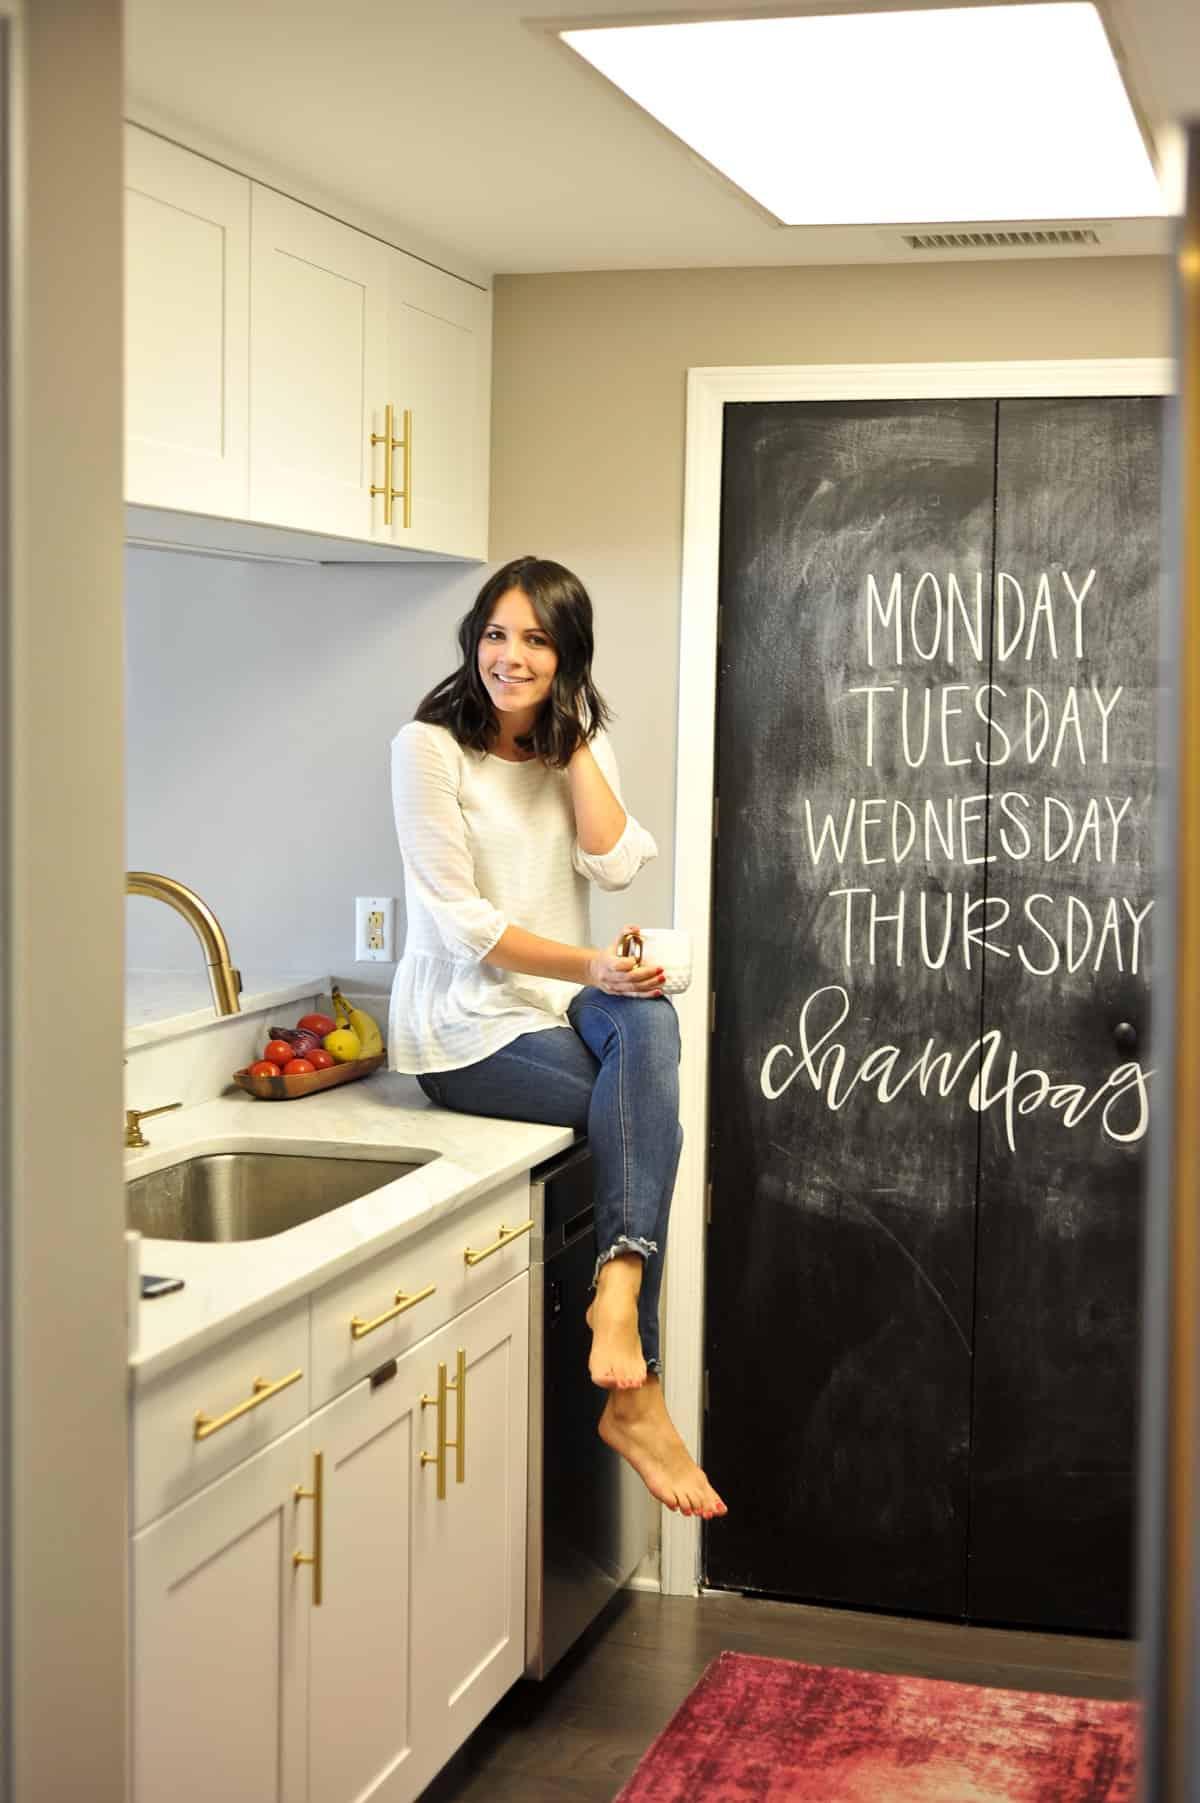 White kitchen ideas, white and brass kitchen, kitchen inspiration - My Style Vita - @mystylevita - 5